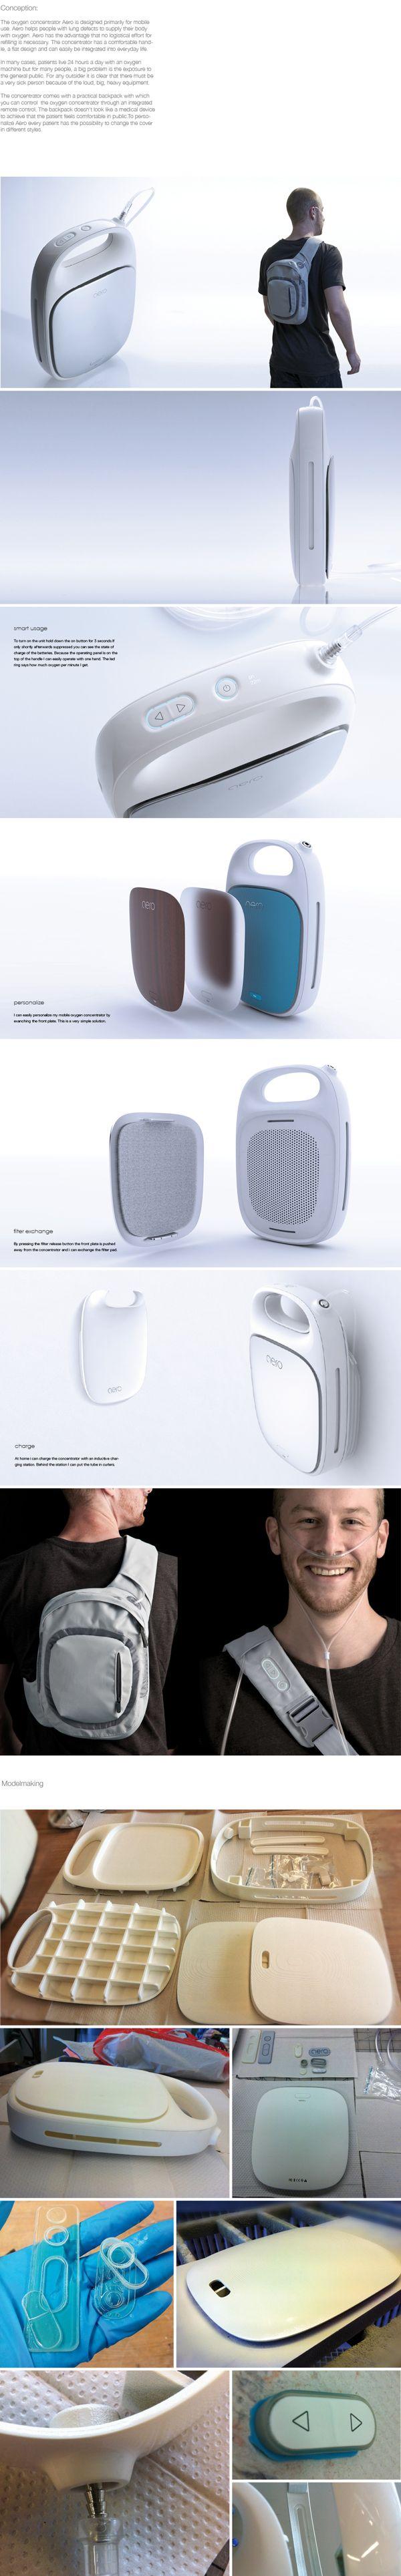 Mobile Oxygen By Lina Kuroi Mobileoxygen Lifesaver